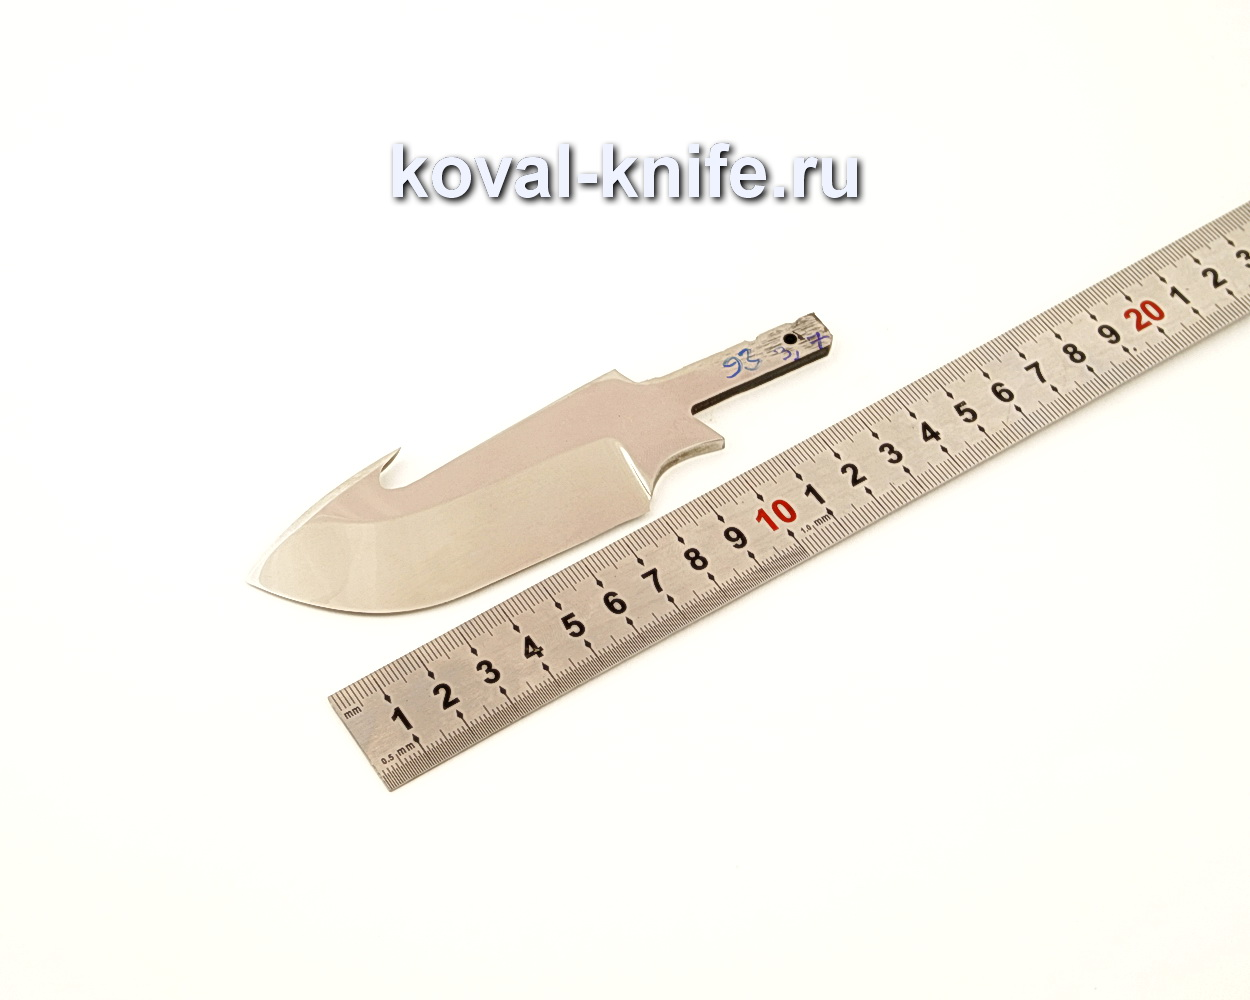 Клинок для ножа из кованой 95Х18 N93